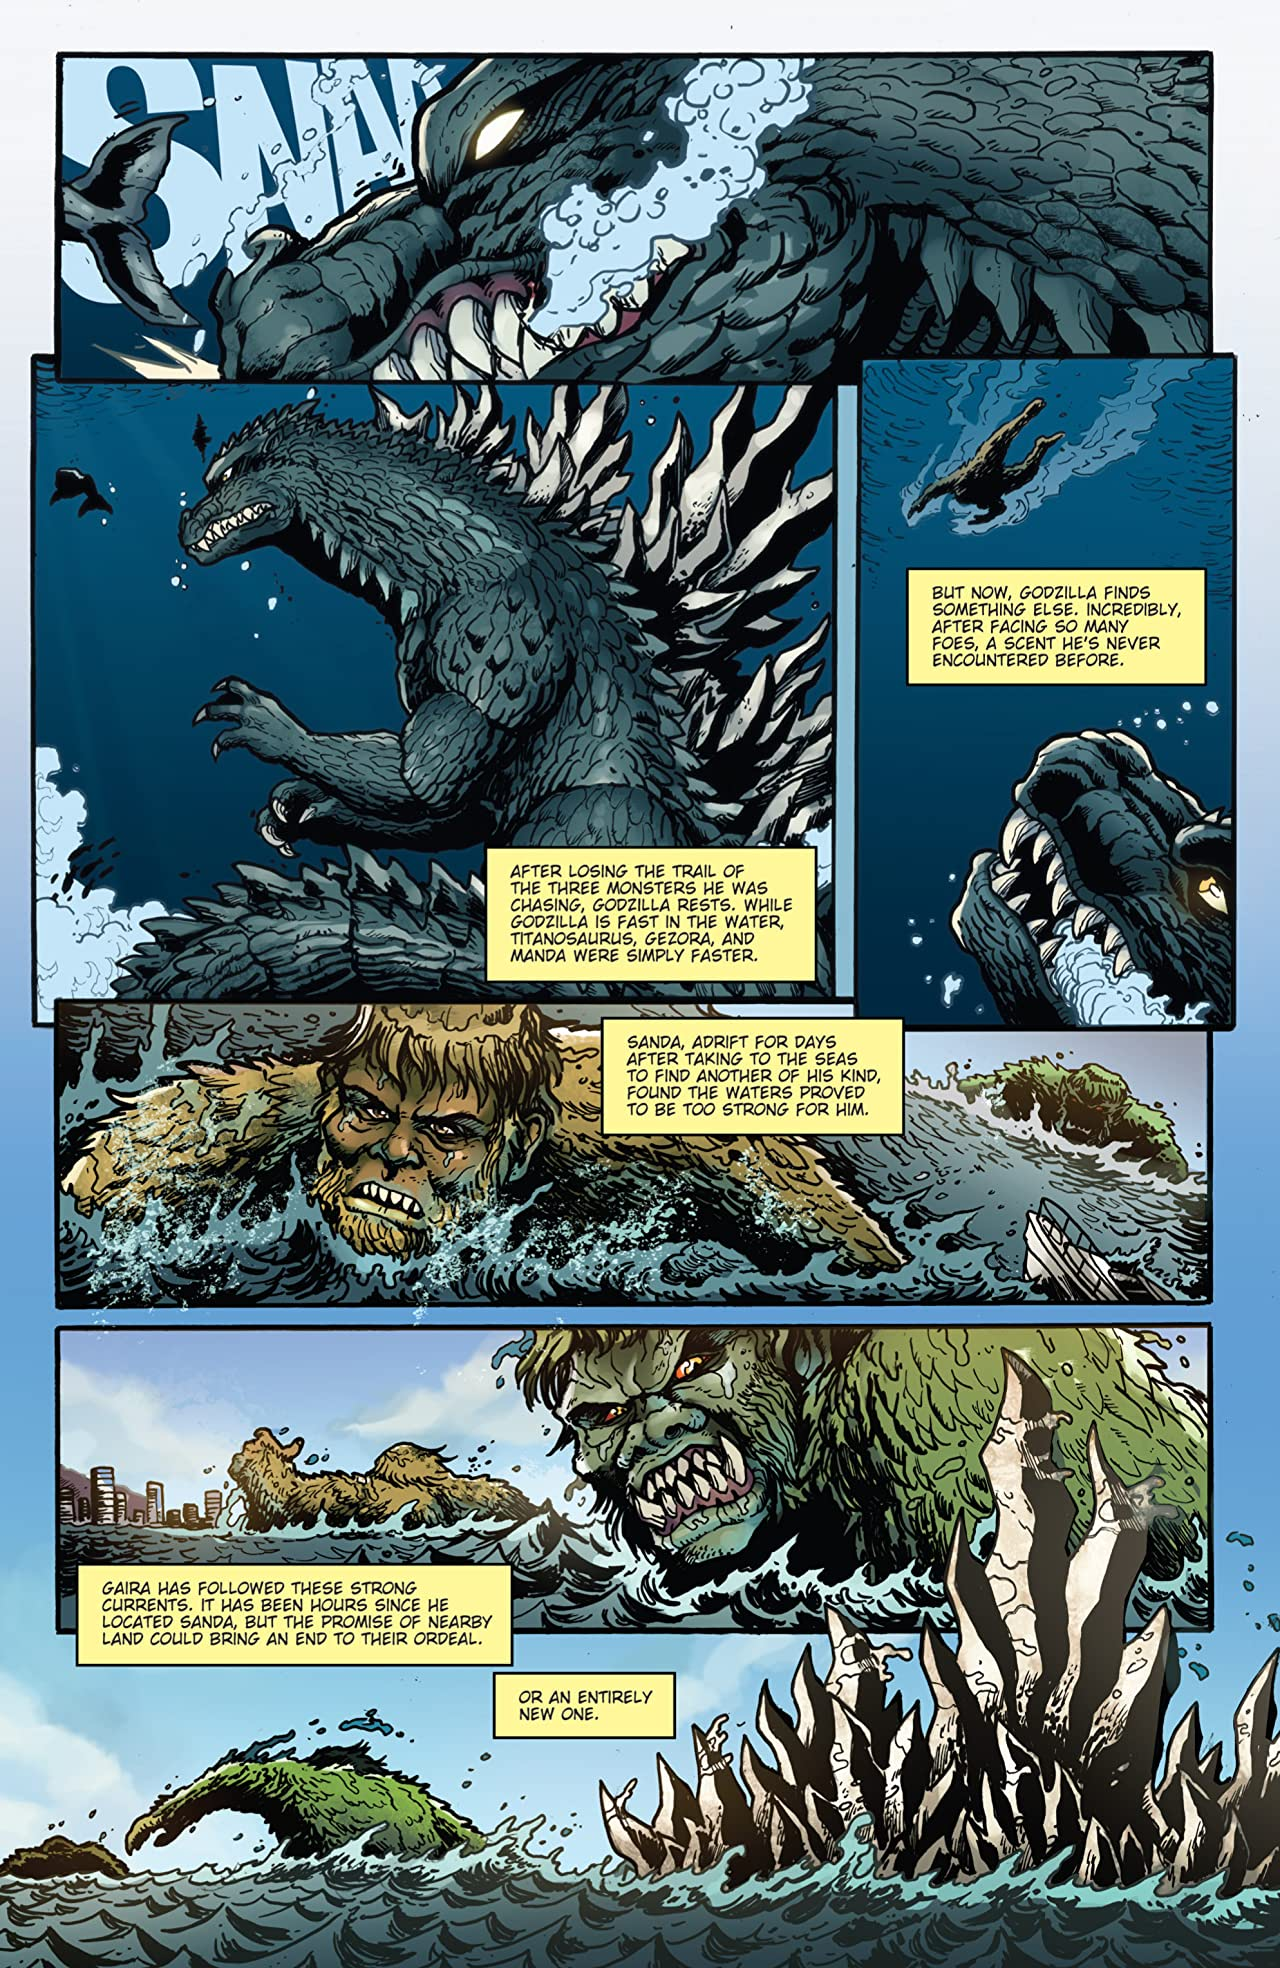 Godzilla: Rulers of Earth #10